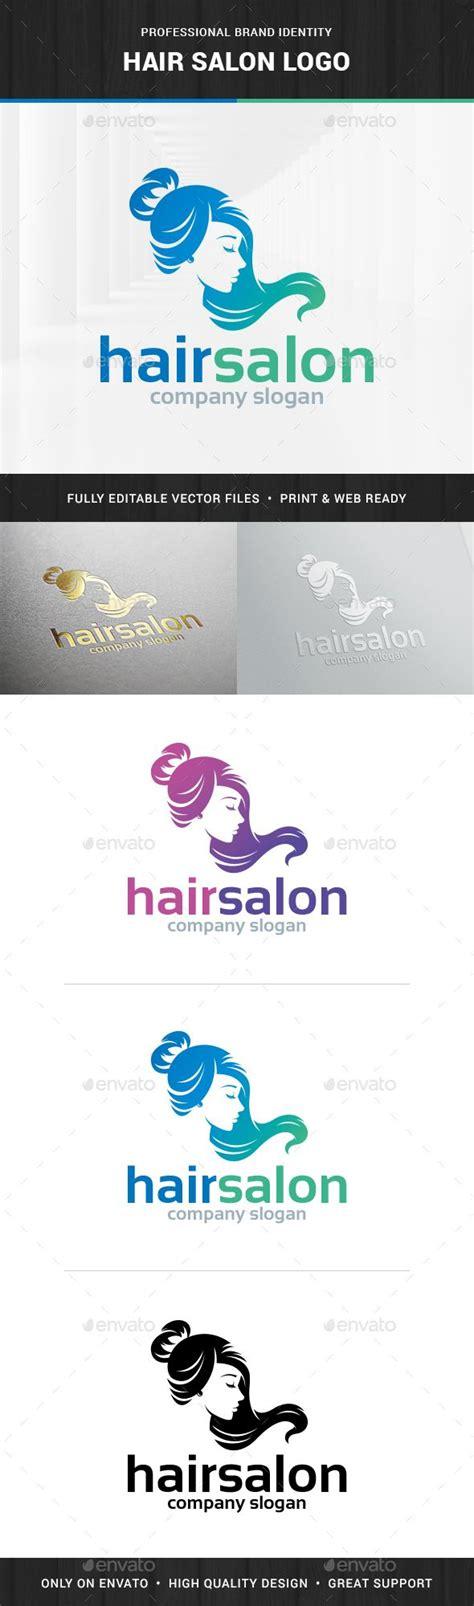 elegant logo design photoshop hair salon female logo salons logo templates and logos